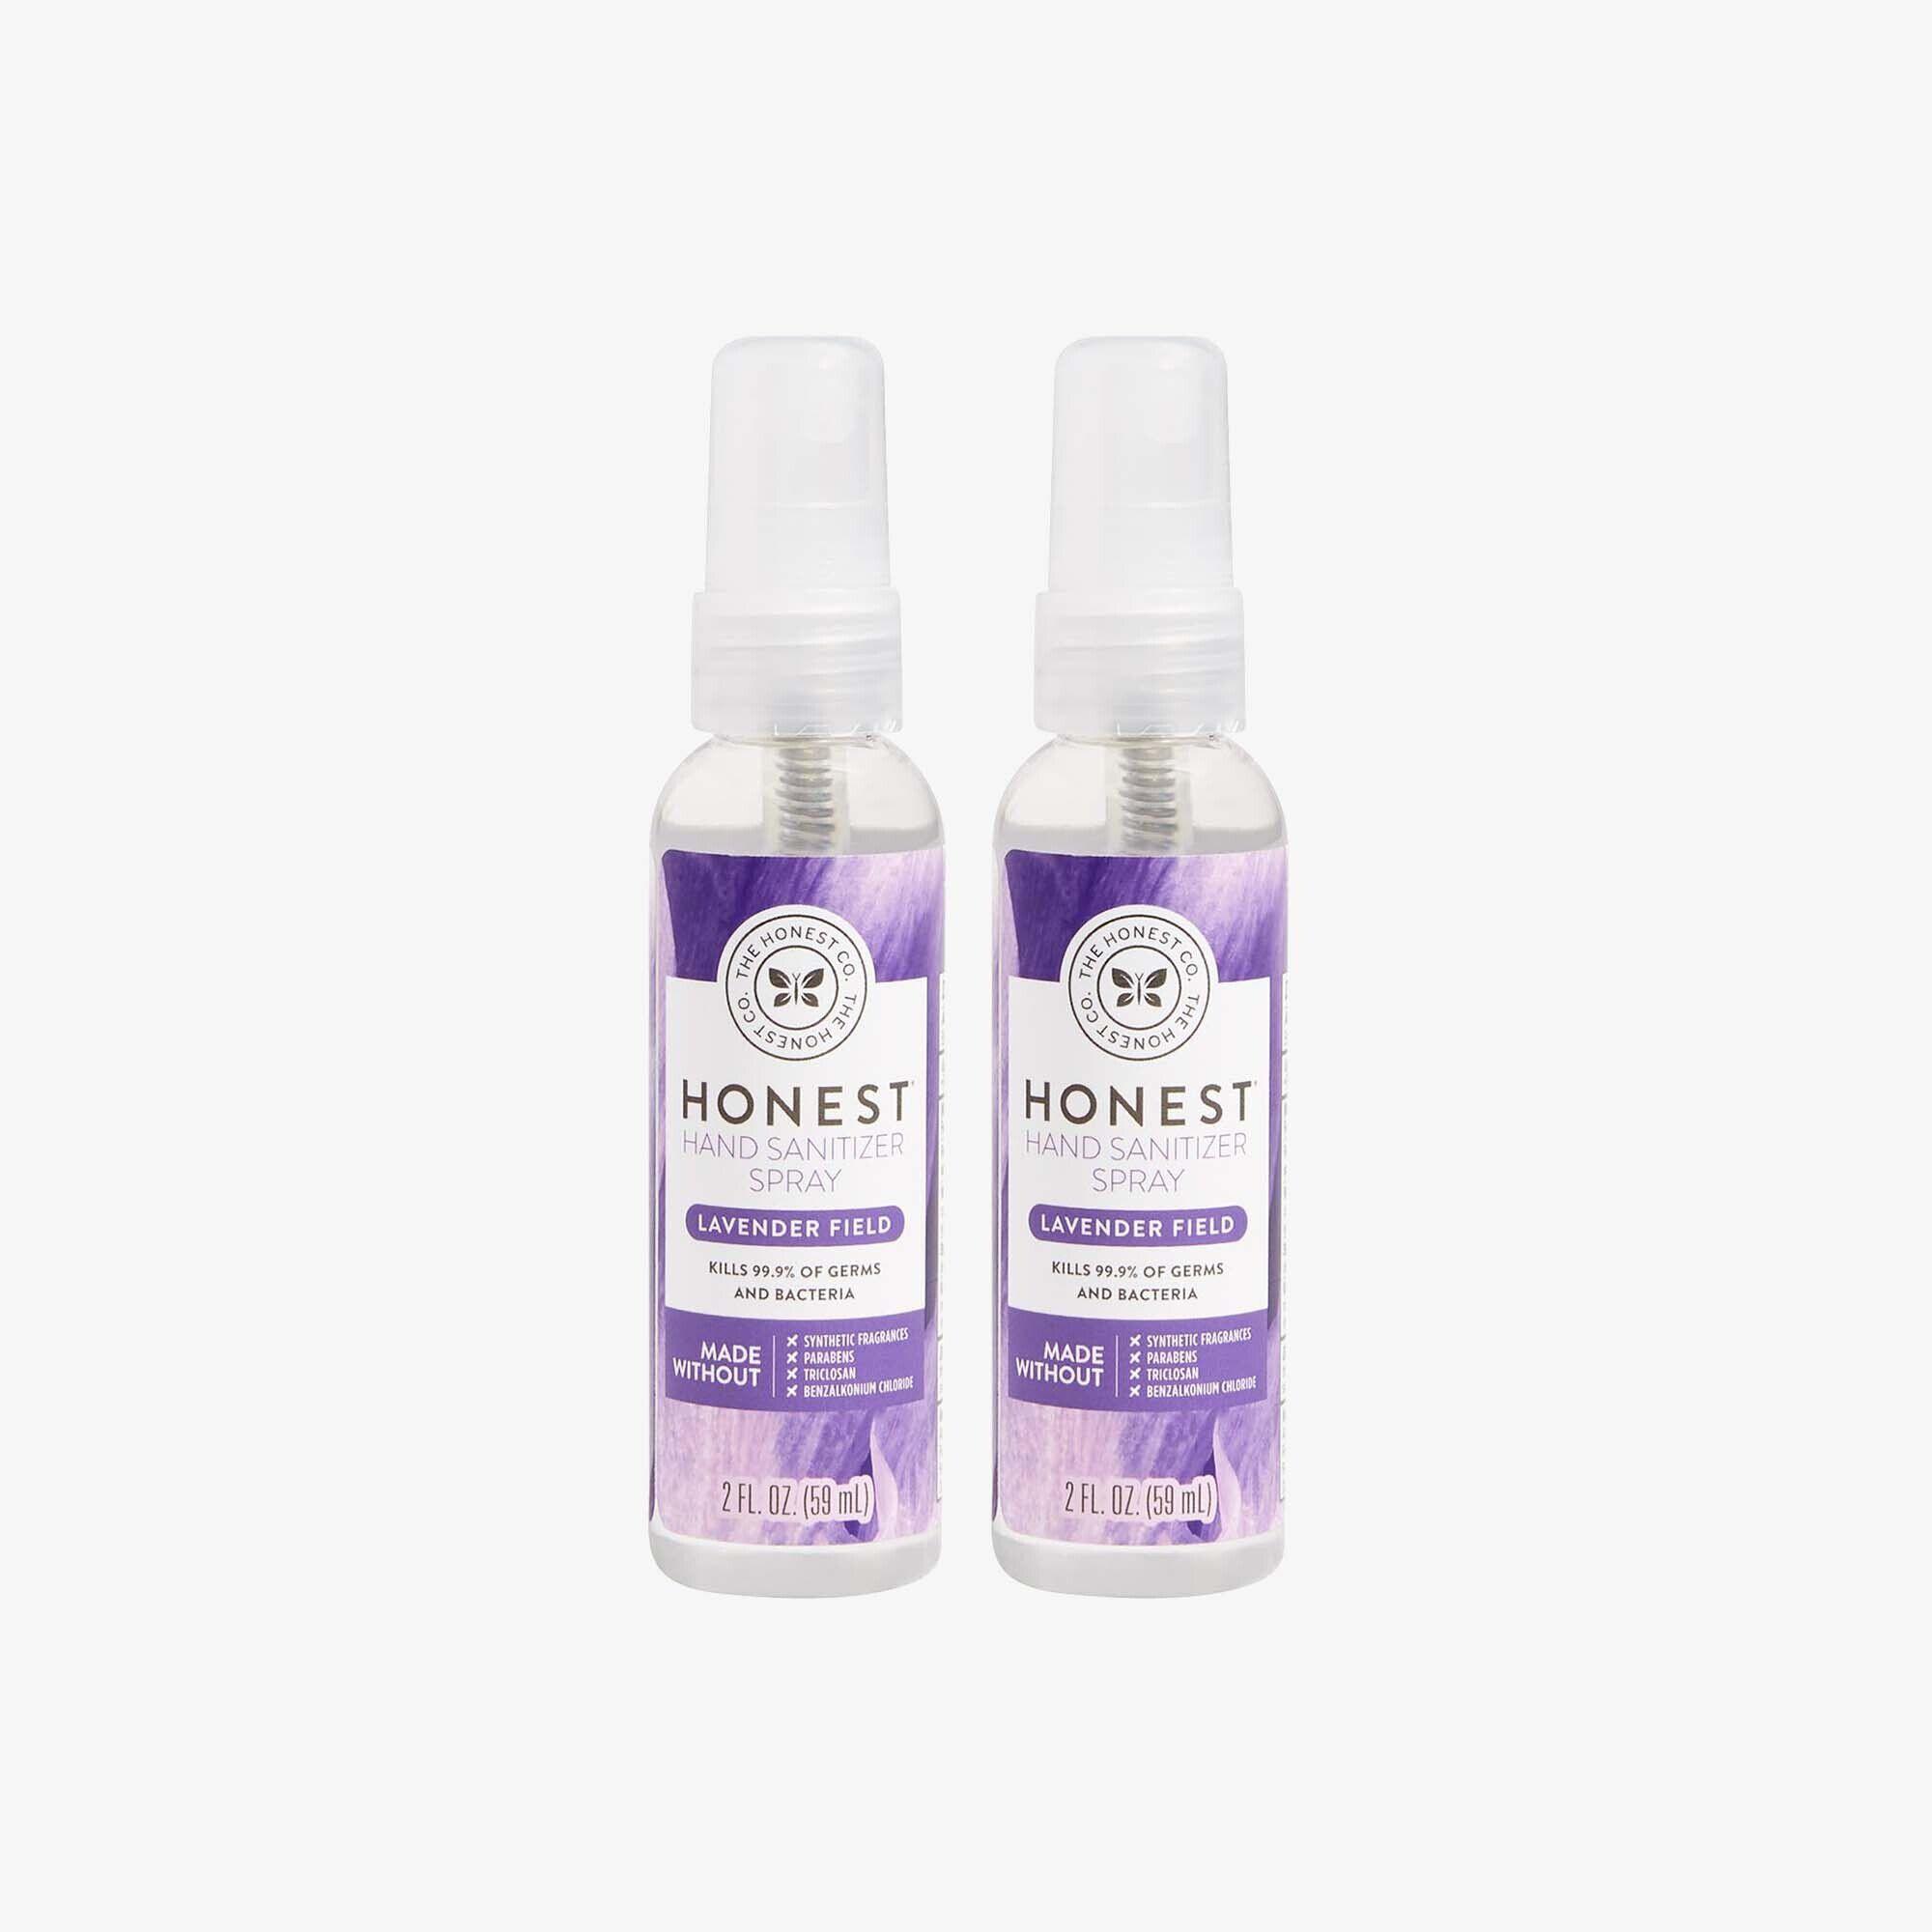 Hand Sanitizer Spray, Lavender Field, 2-Pack